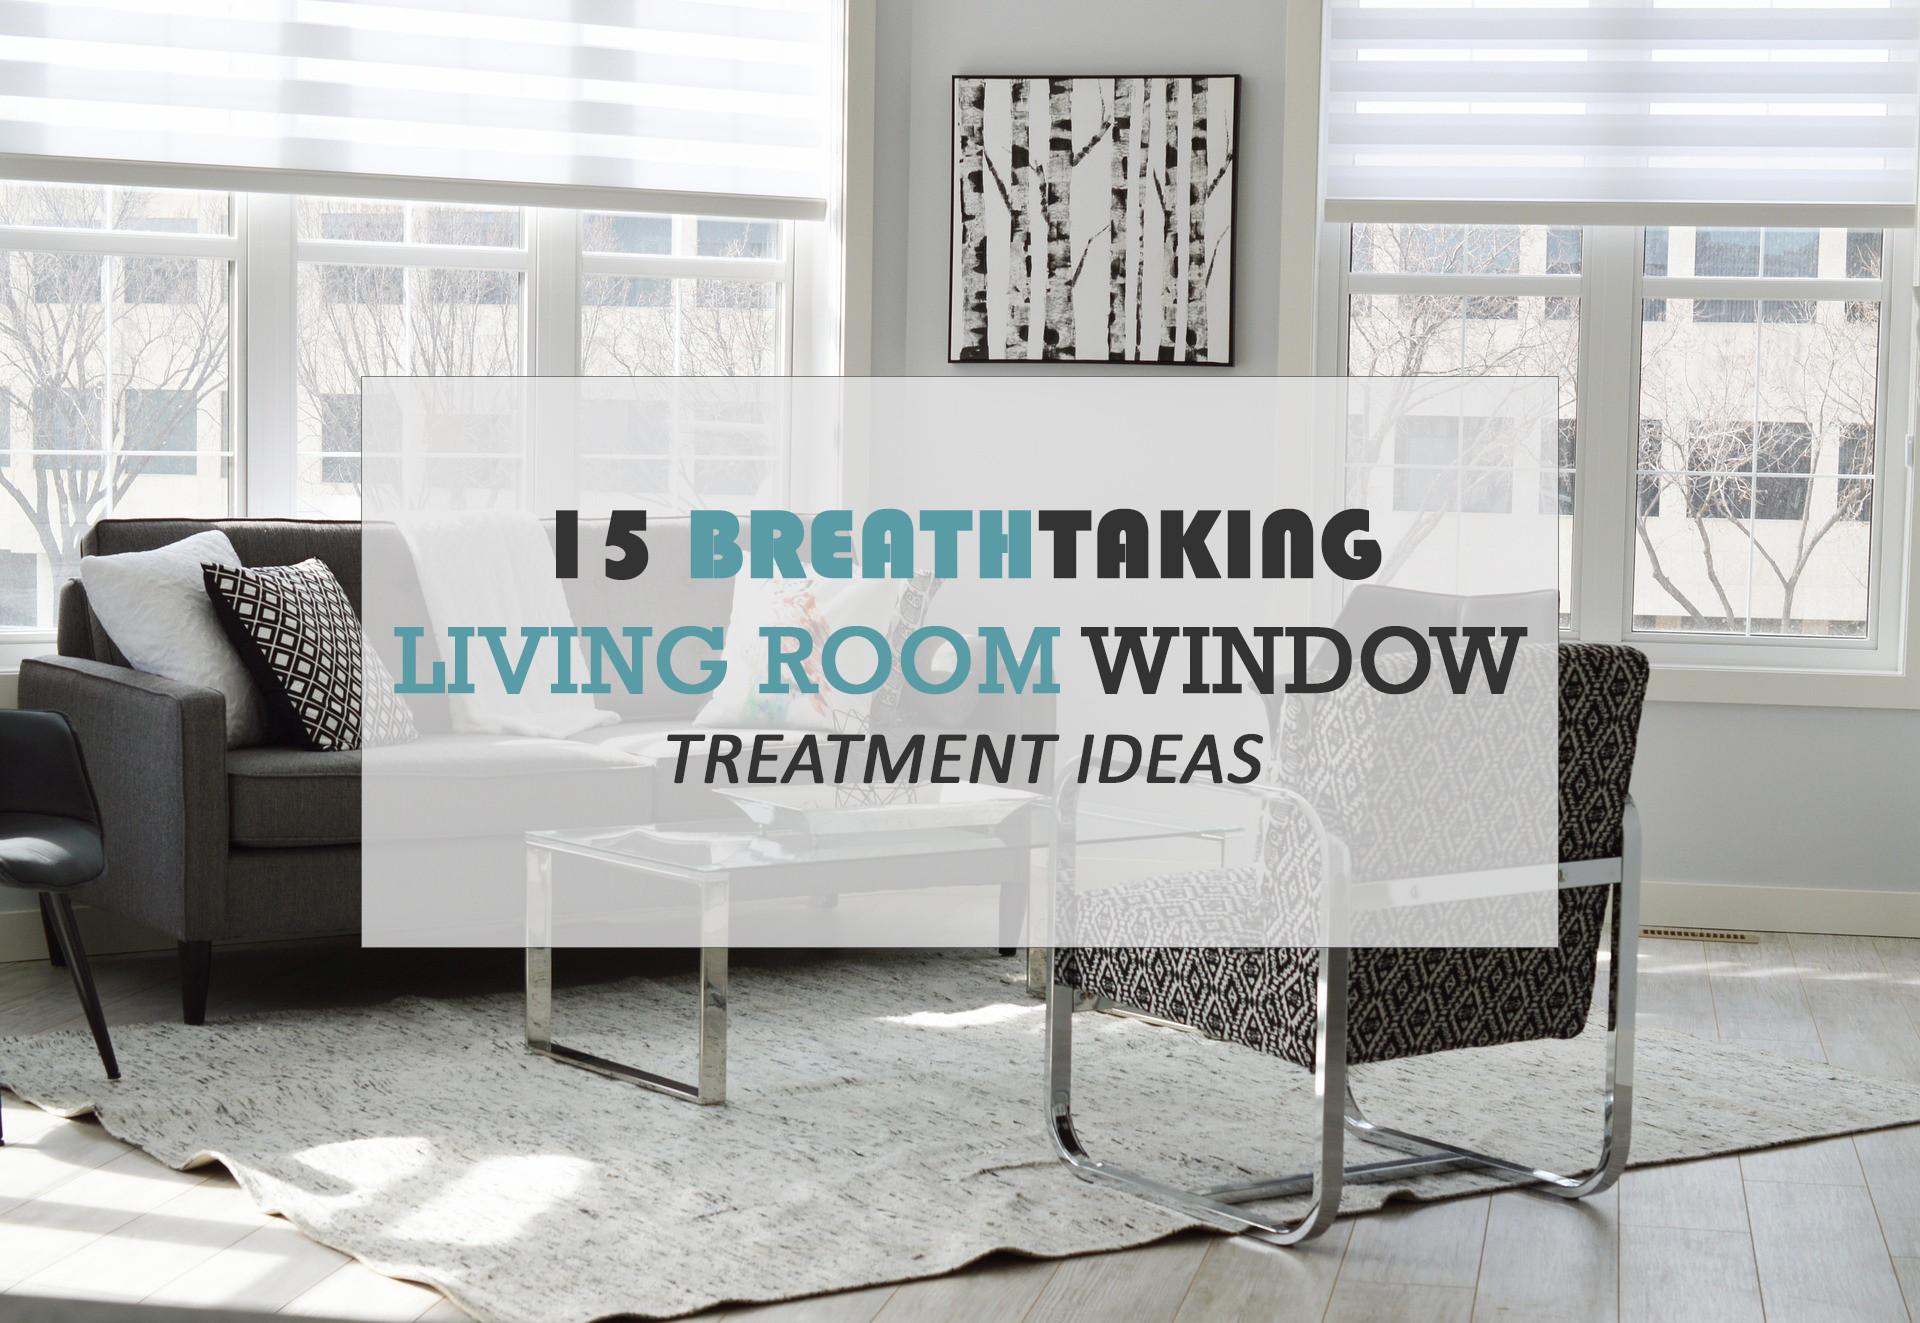 15 Breathtaking Living Room Window Treatment Ideas